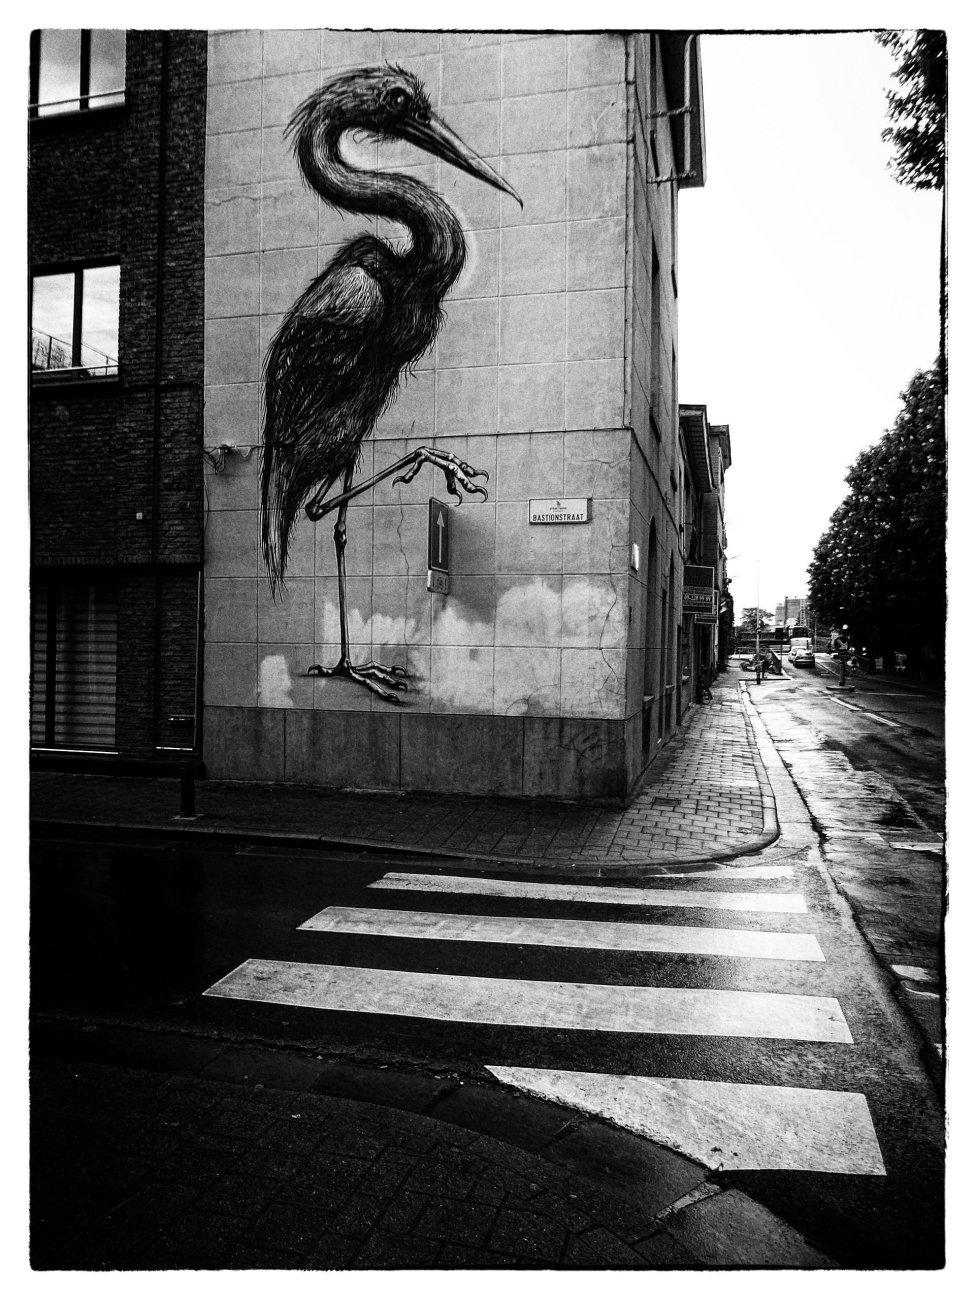 Stork Crossing